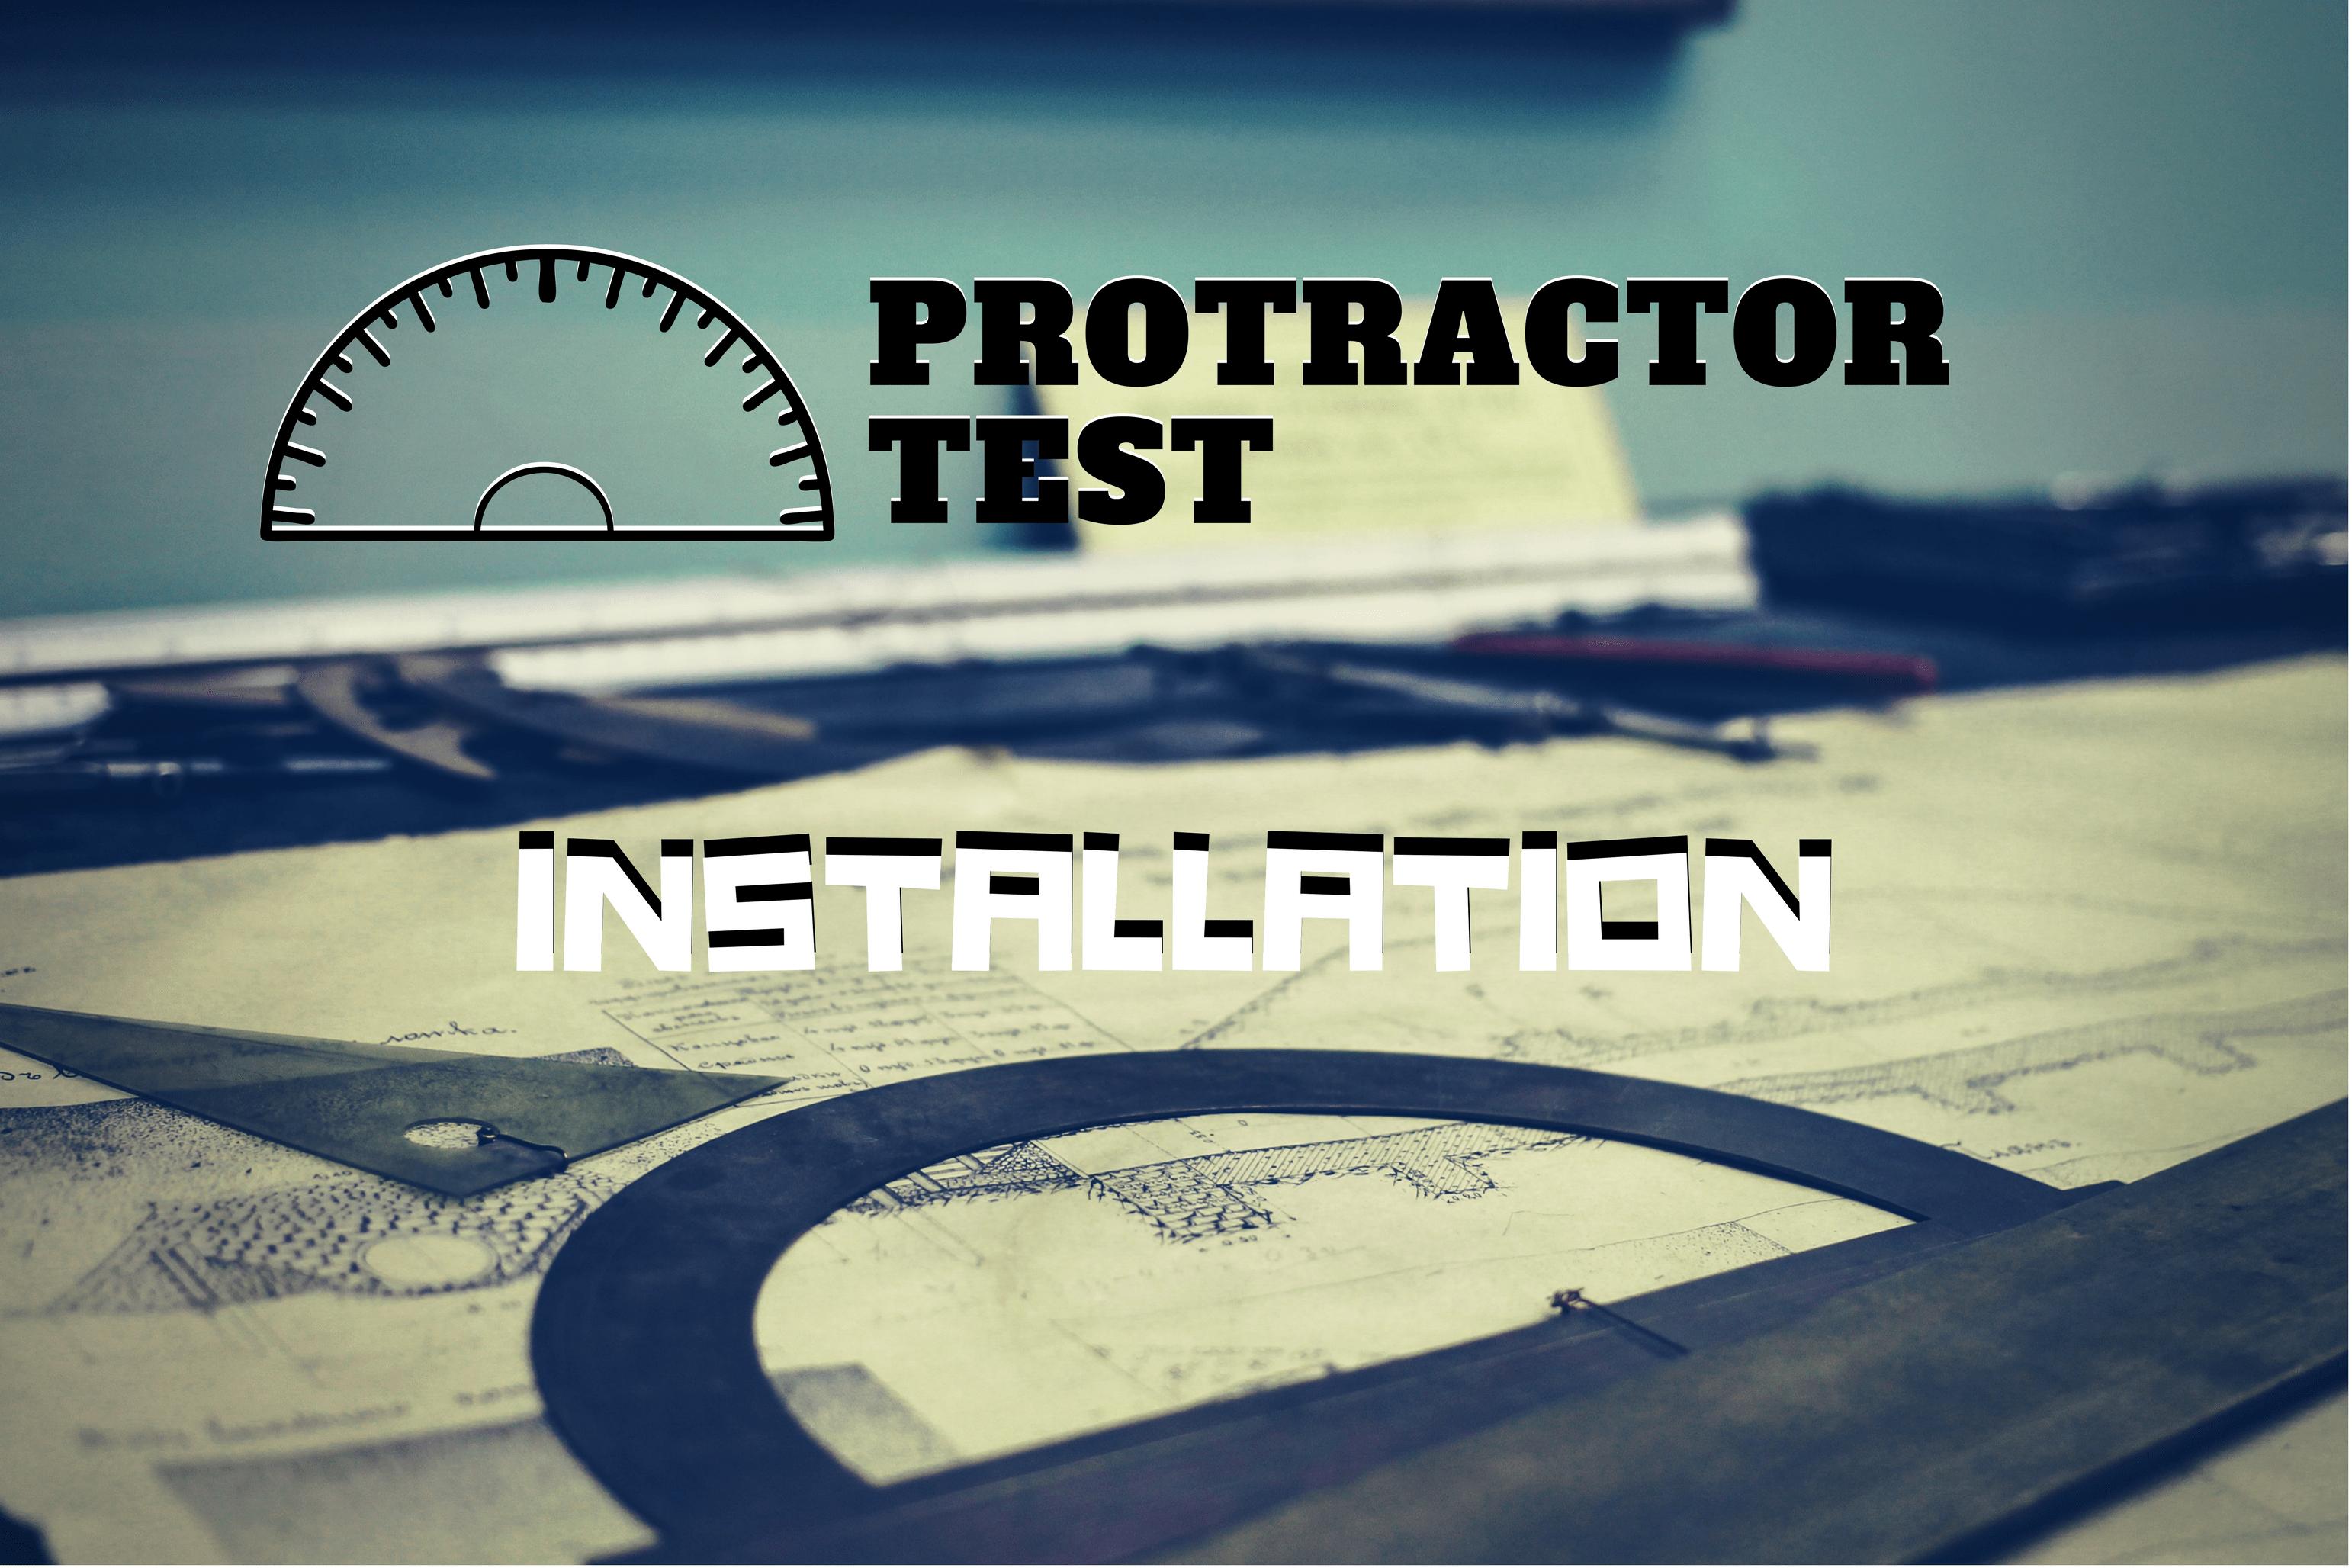 Protractor Tutorial - Installation - GlitchITSystem